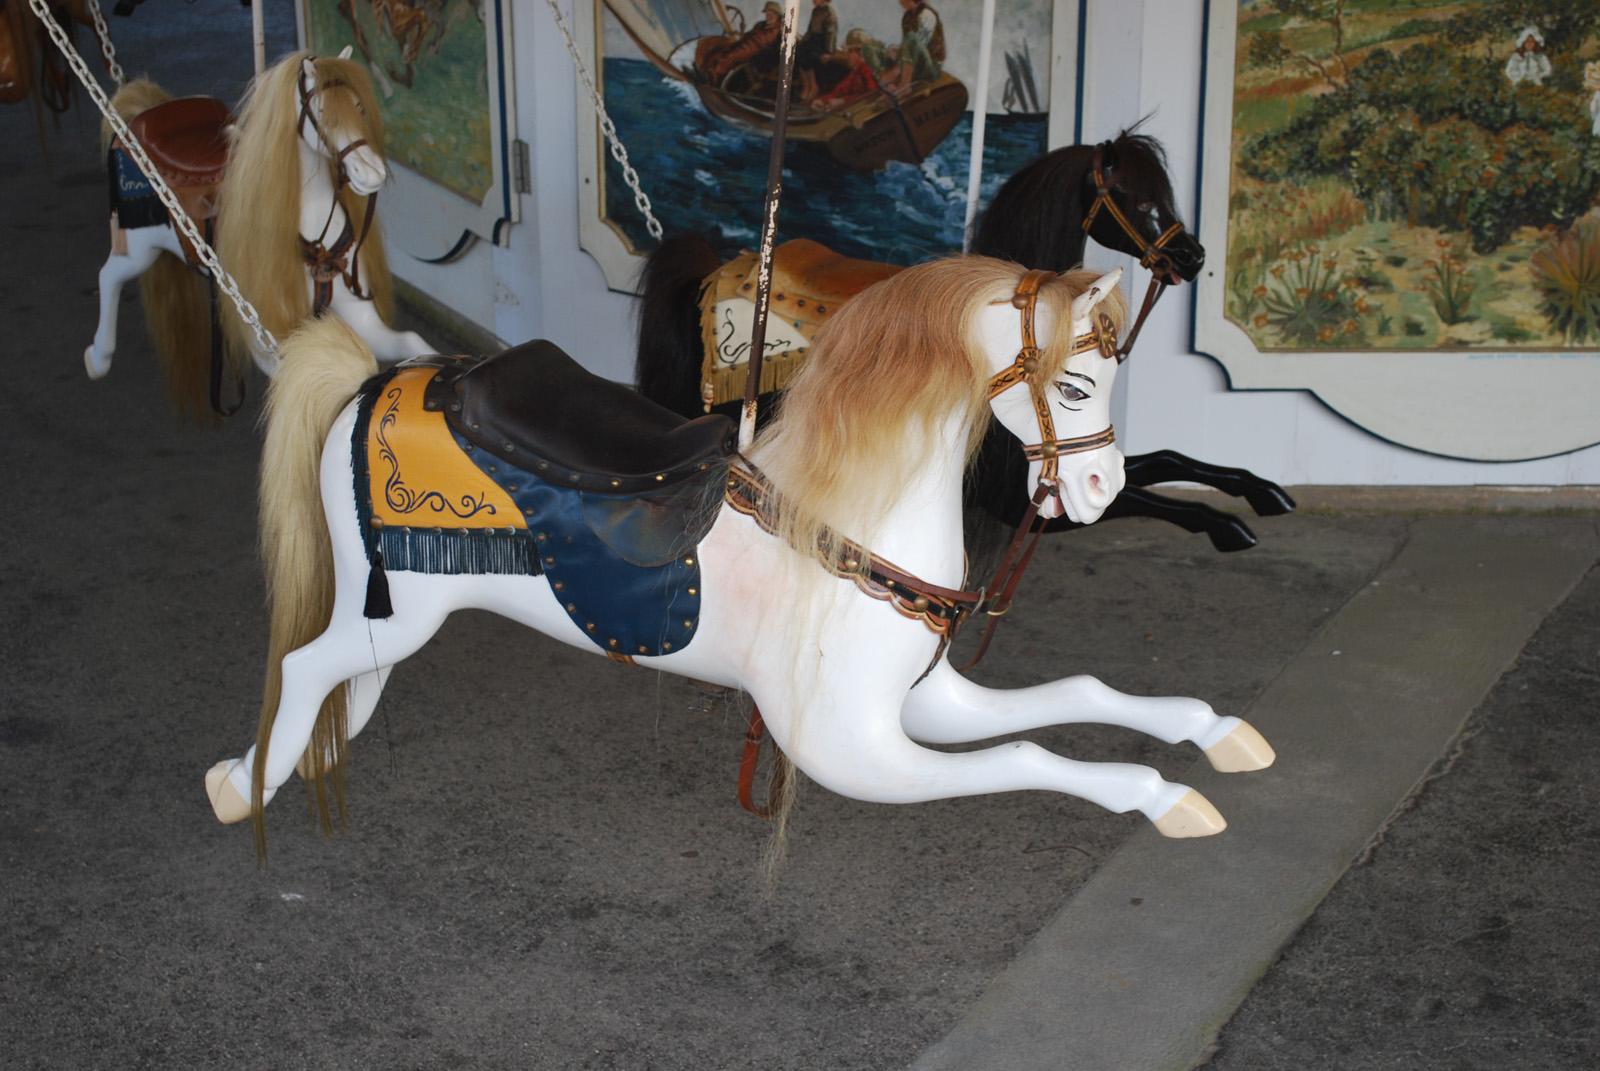 Watch-Hill-RI-1884-historic-carousel-Dare-swing-ride-13